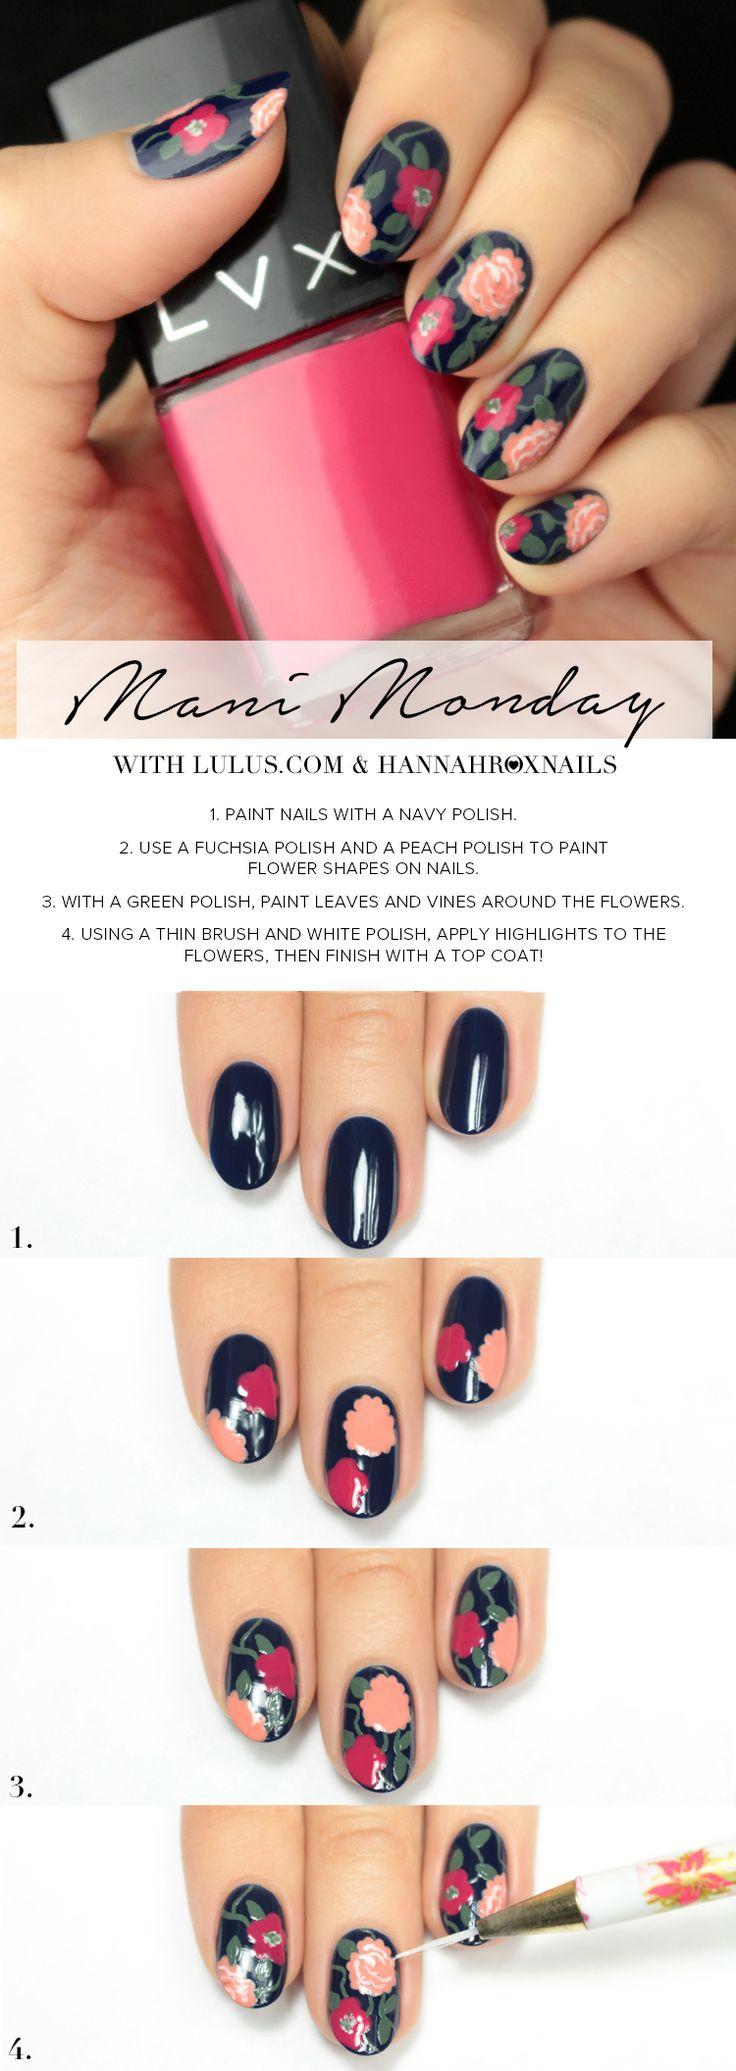 Mani Monday: Blue Floral Print Nail Tutorial at LuLus.com!